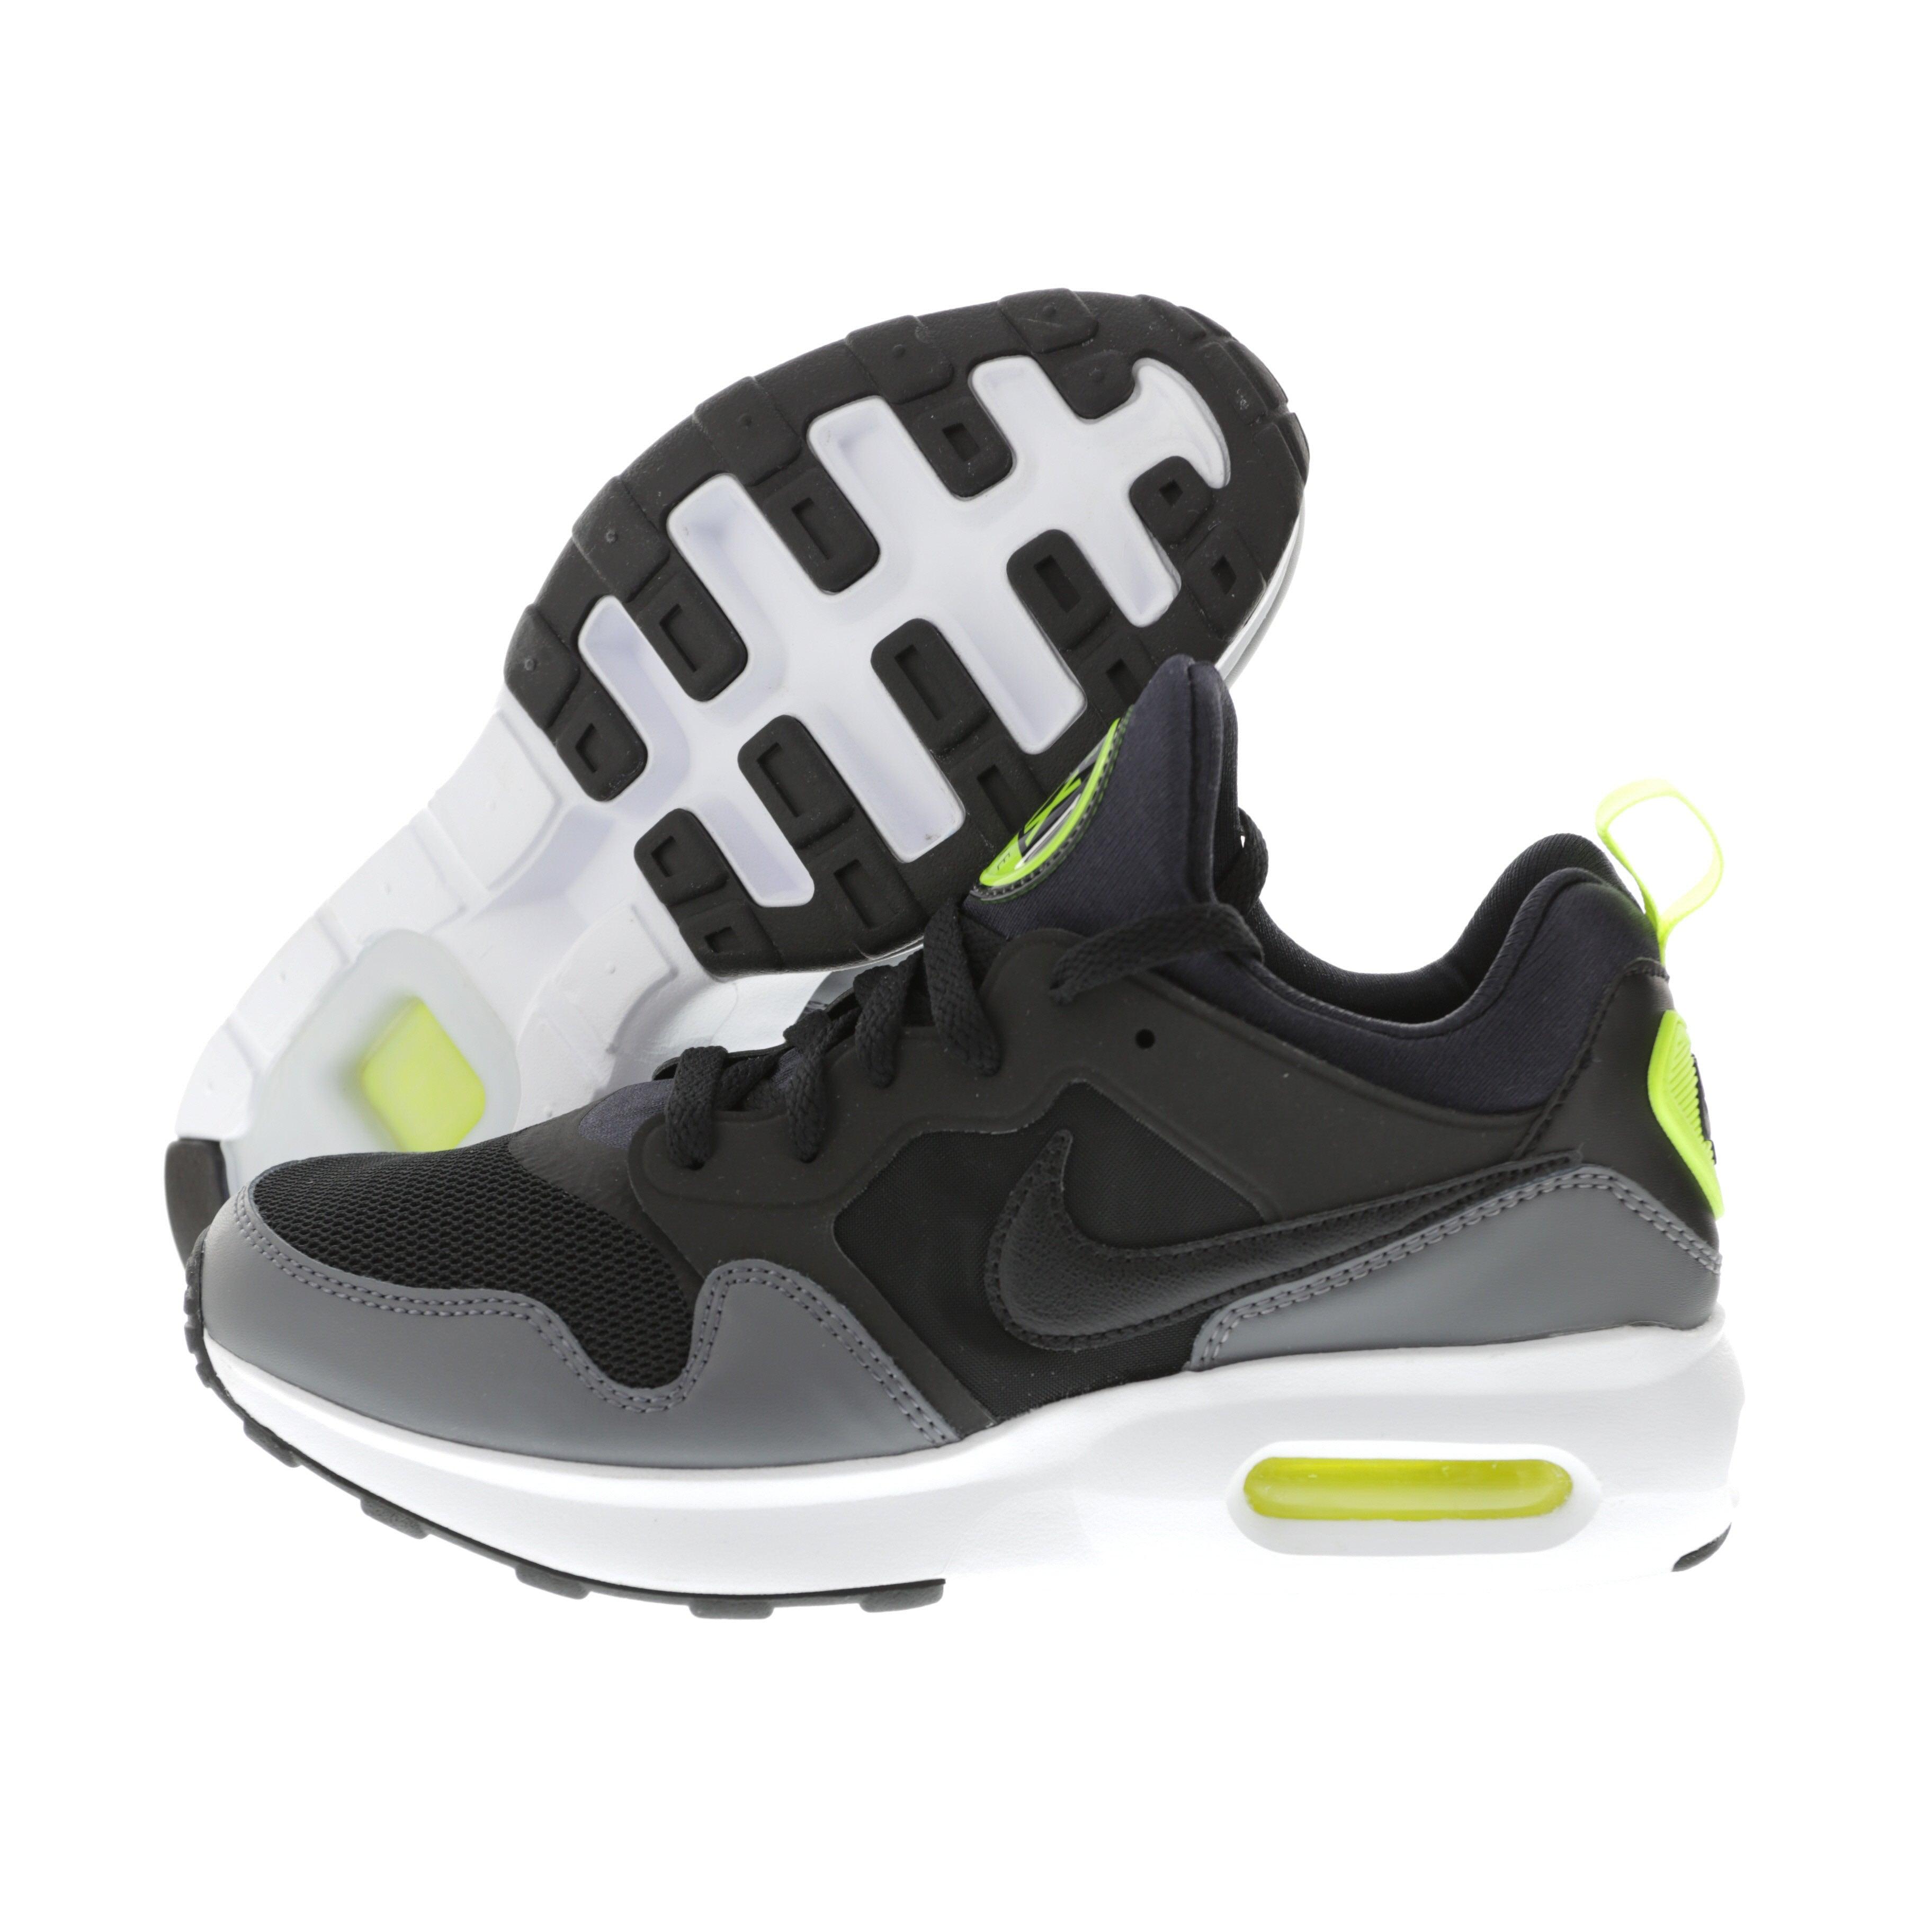 Nike Sports Shoes Sale: Nike Black and Beige Air Max Prime